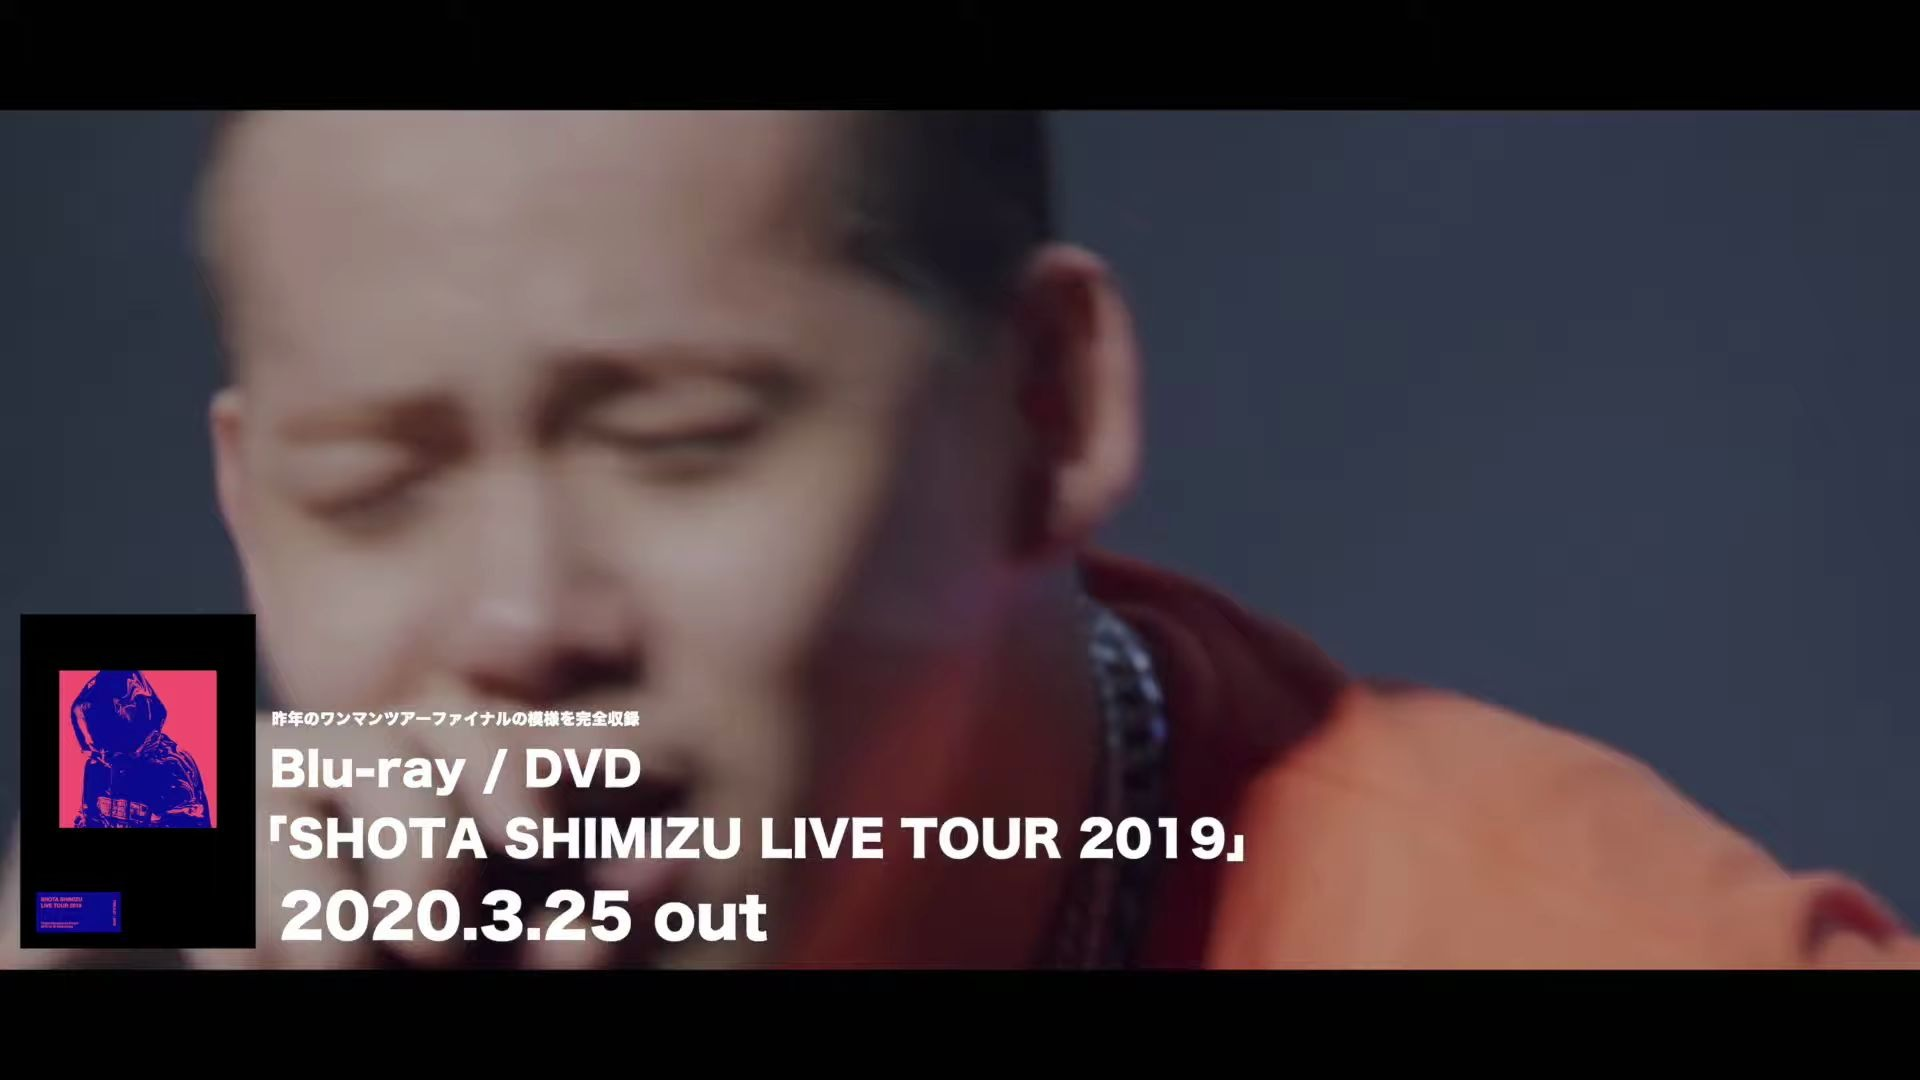 清水 翔太 youtube